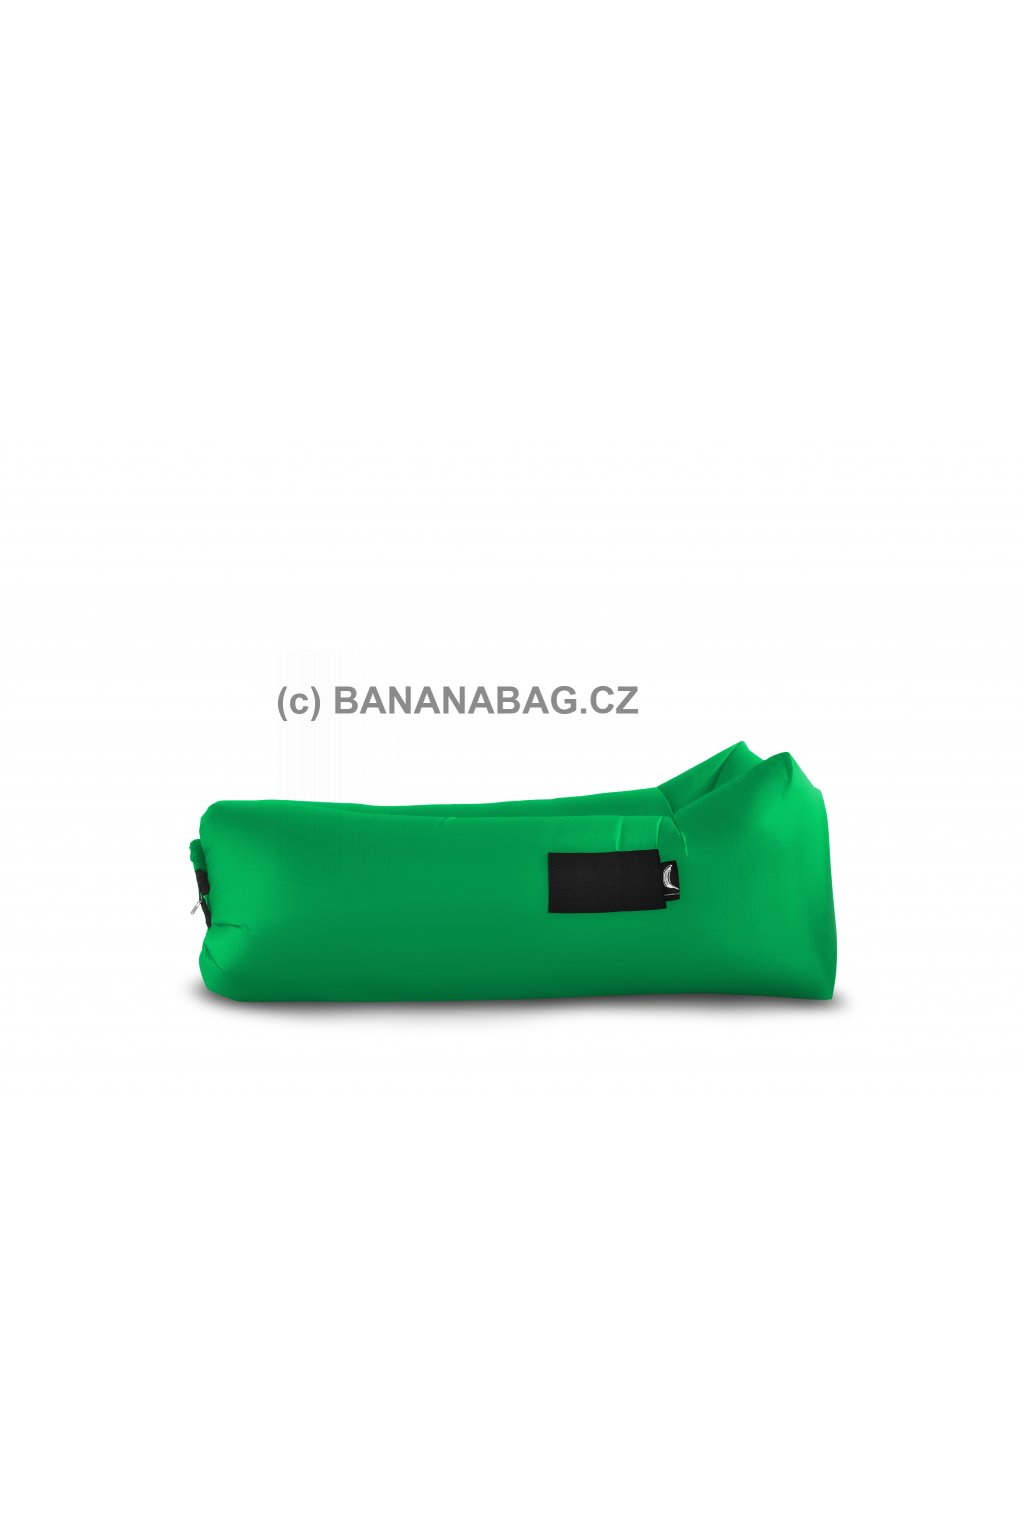 lazy bag Bananabag